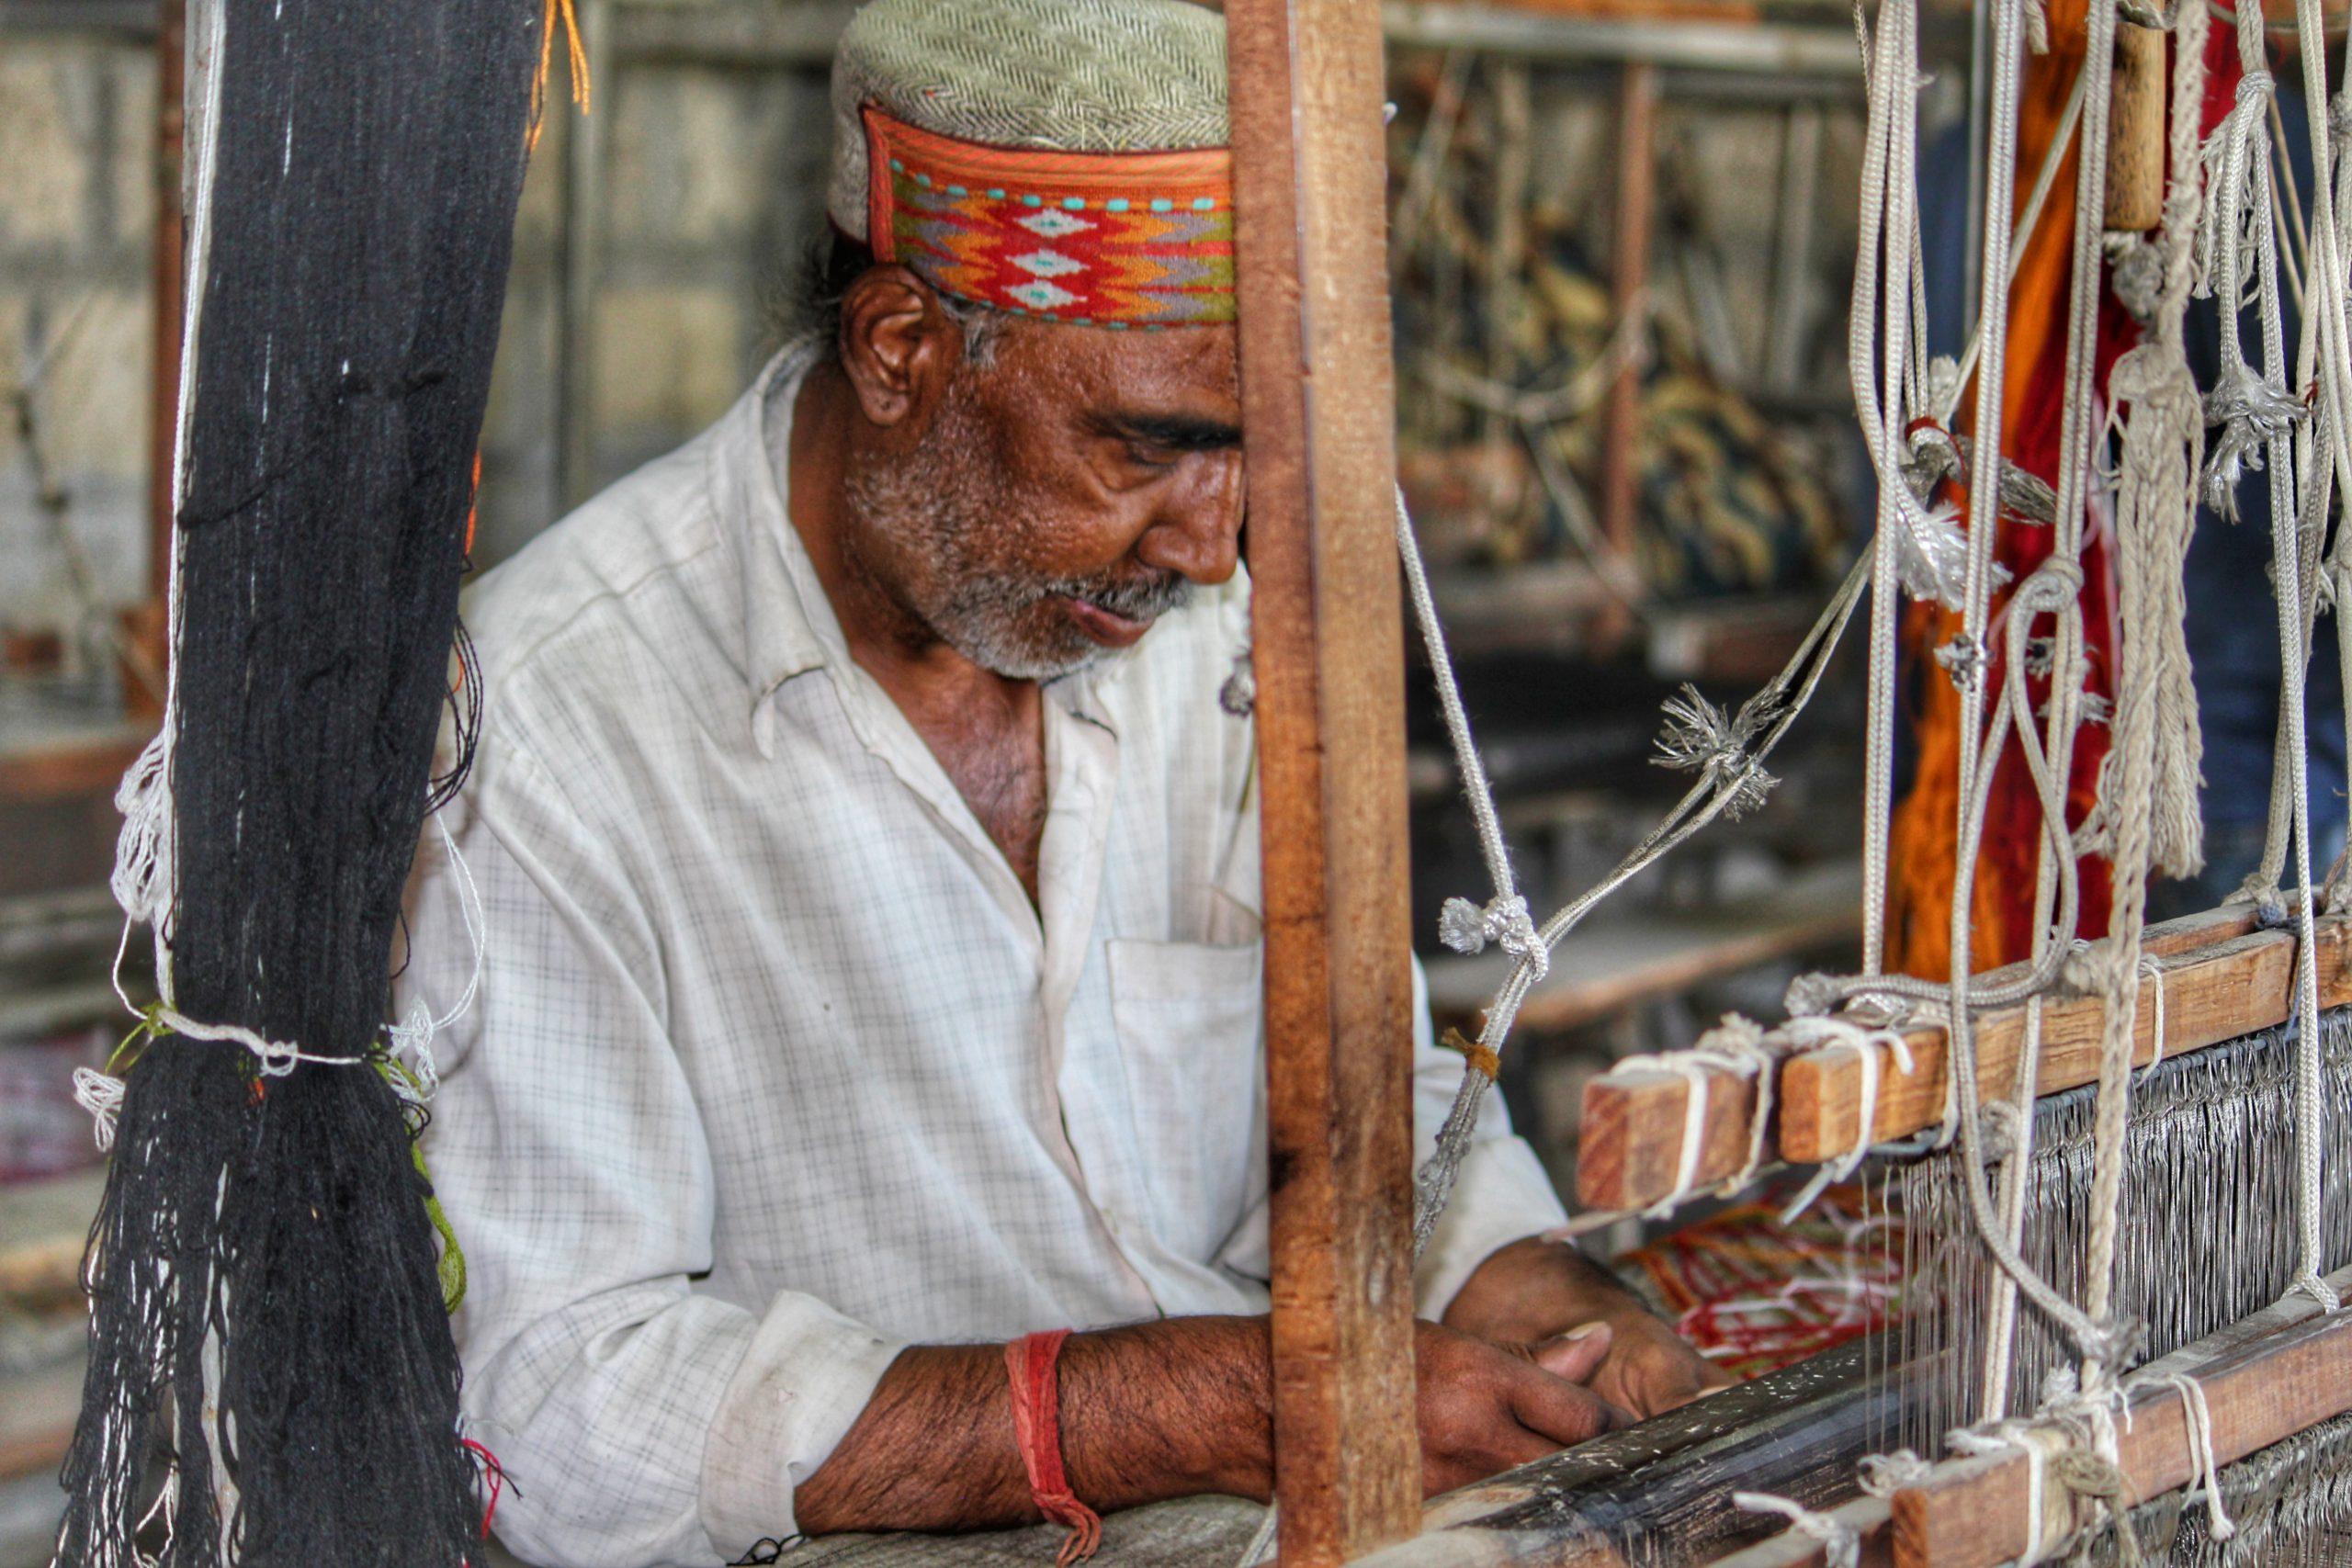 Man working in a fabric workshop of Shimla